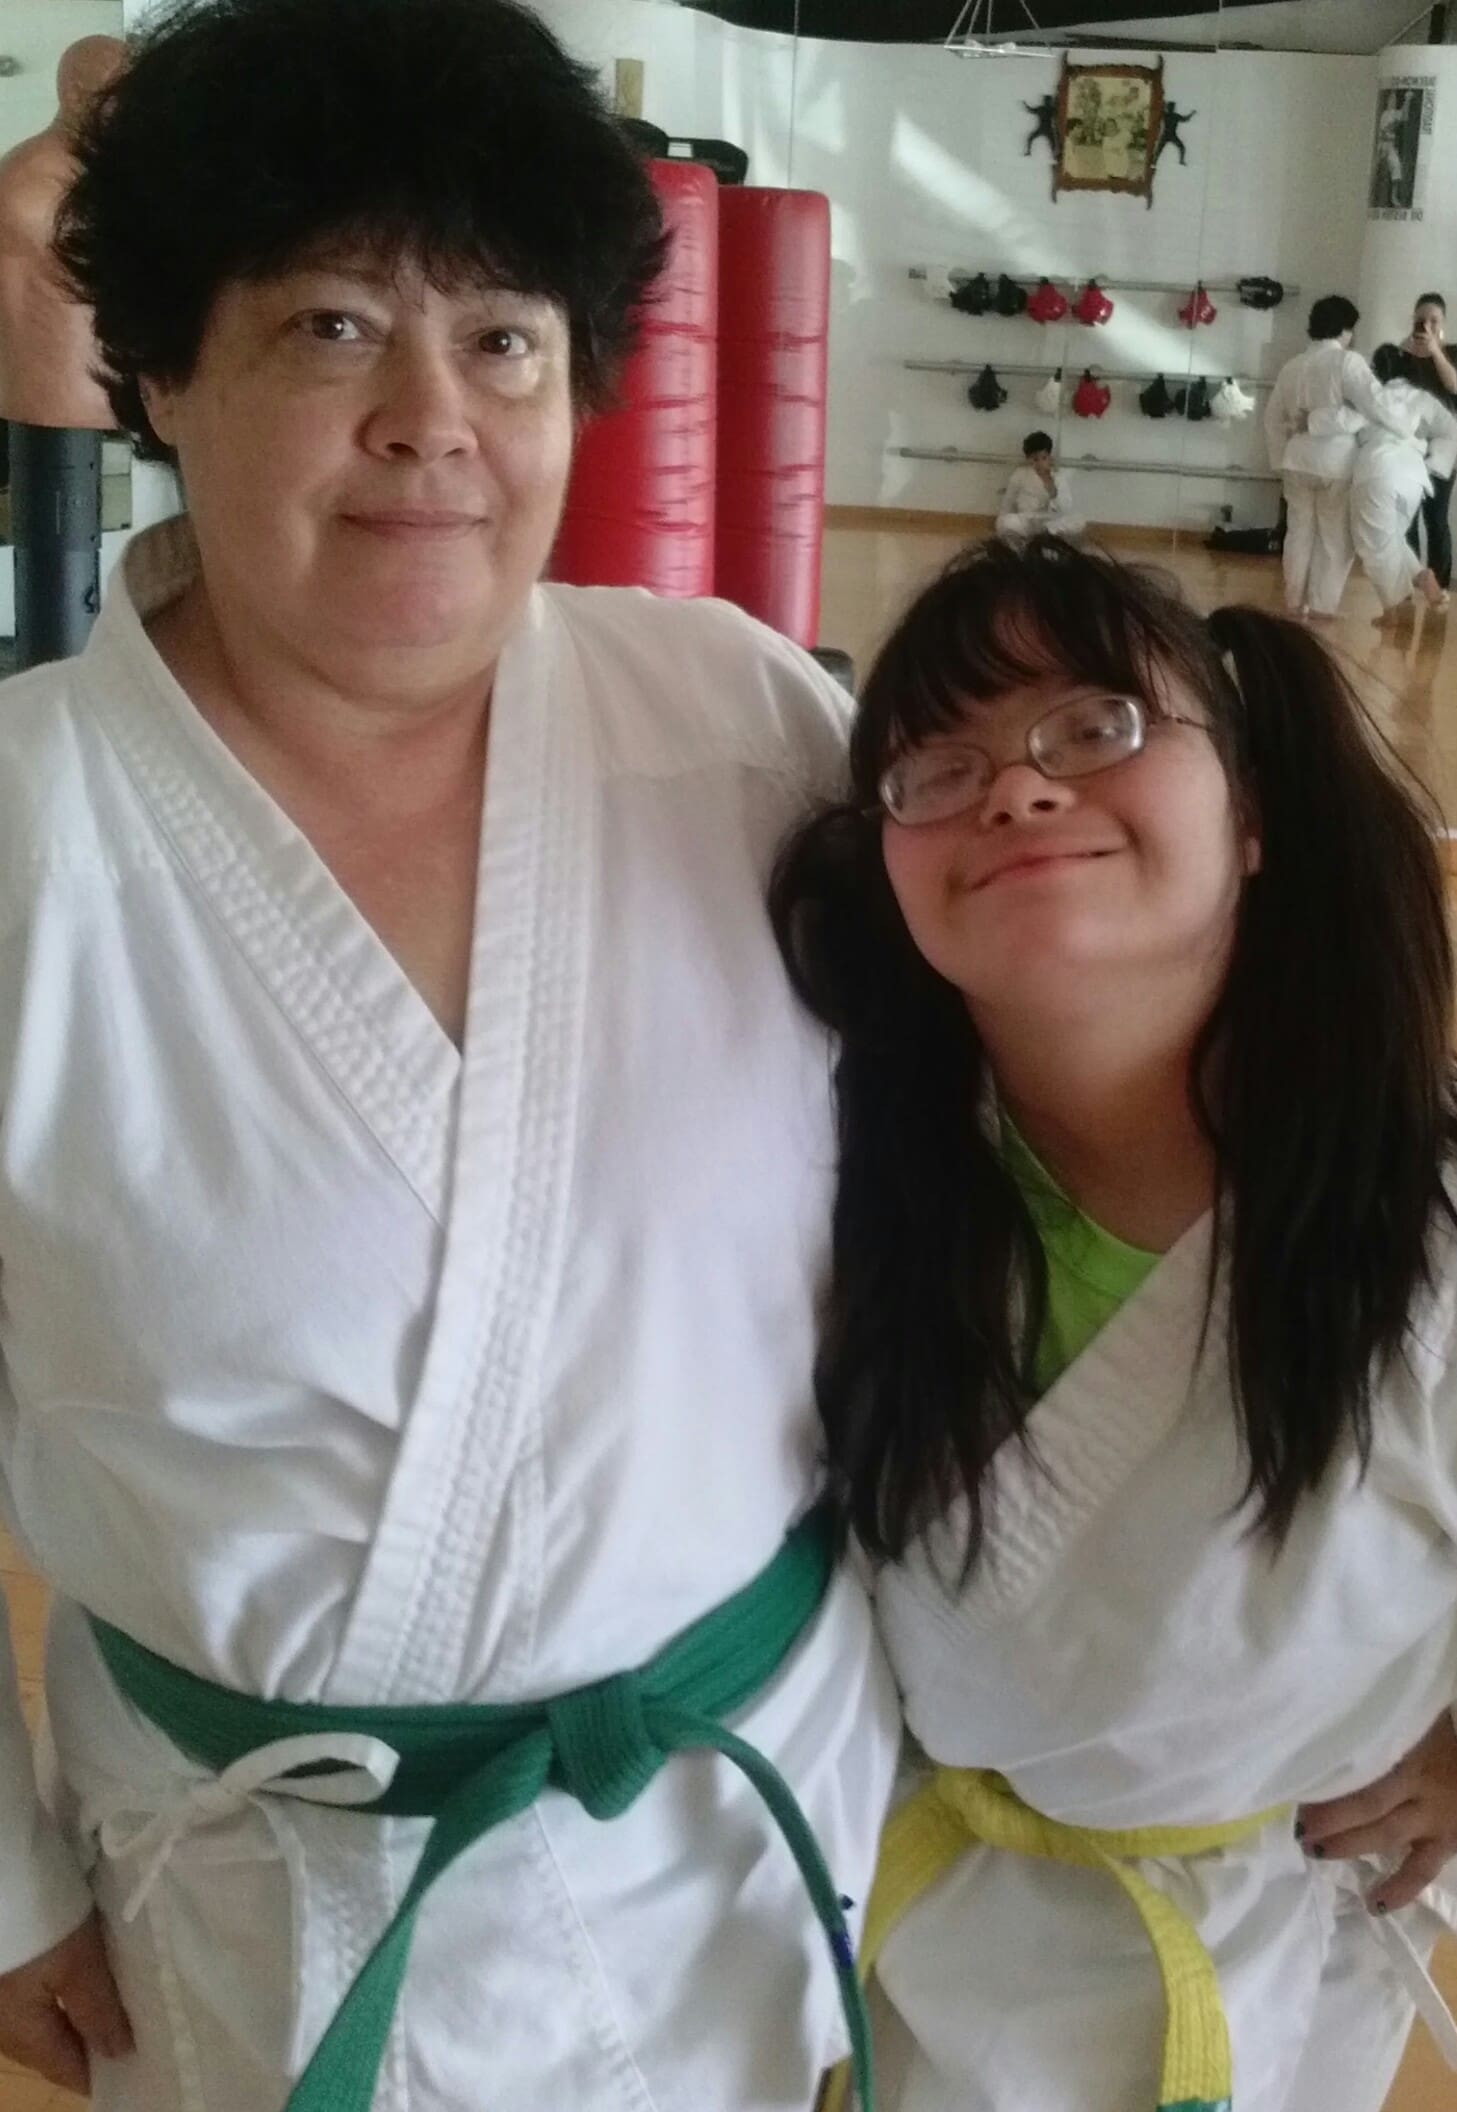 Sherry and Johanna, Traditional Taekwon-Do Center Of Davie Testimonials